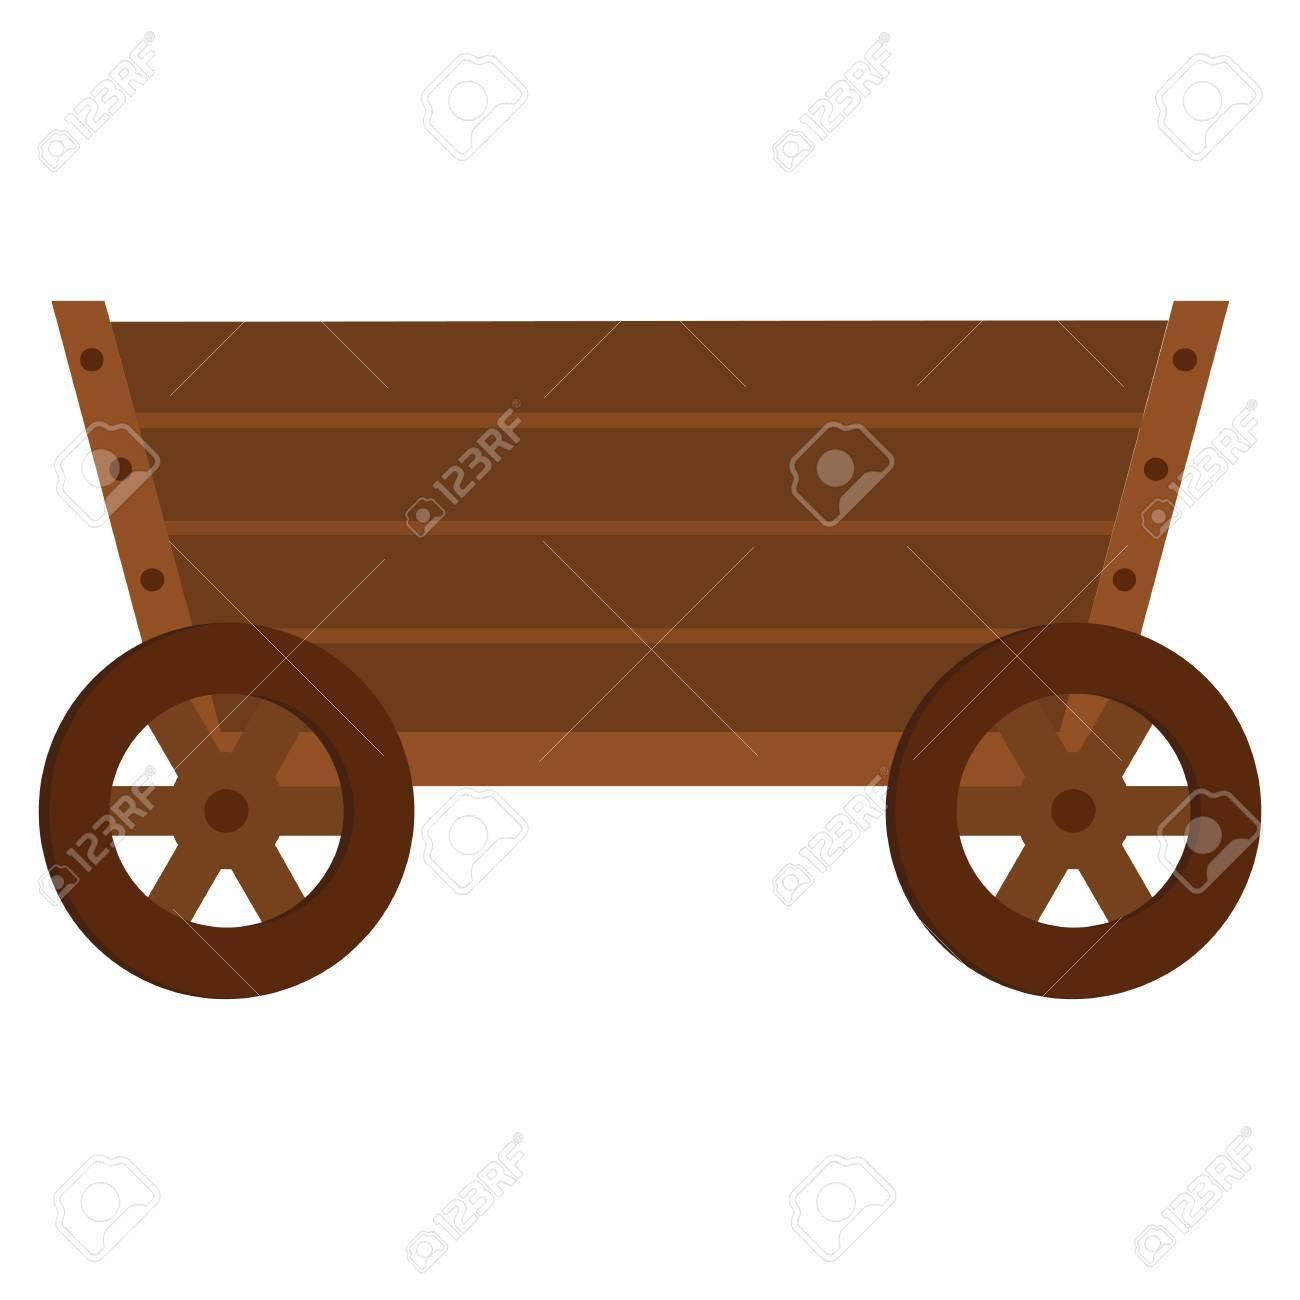 Wooden cart flat icon. Wagon clipart cartoon